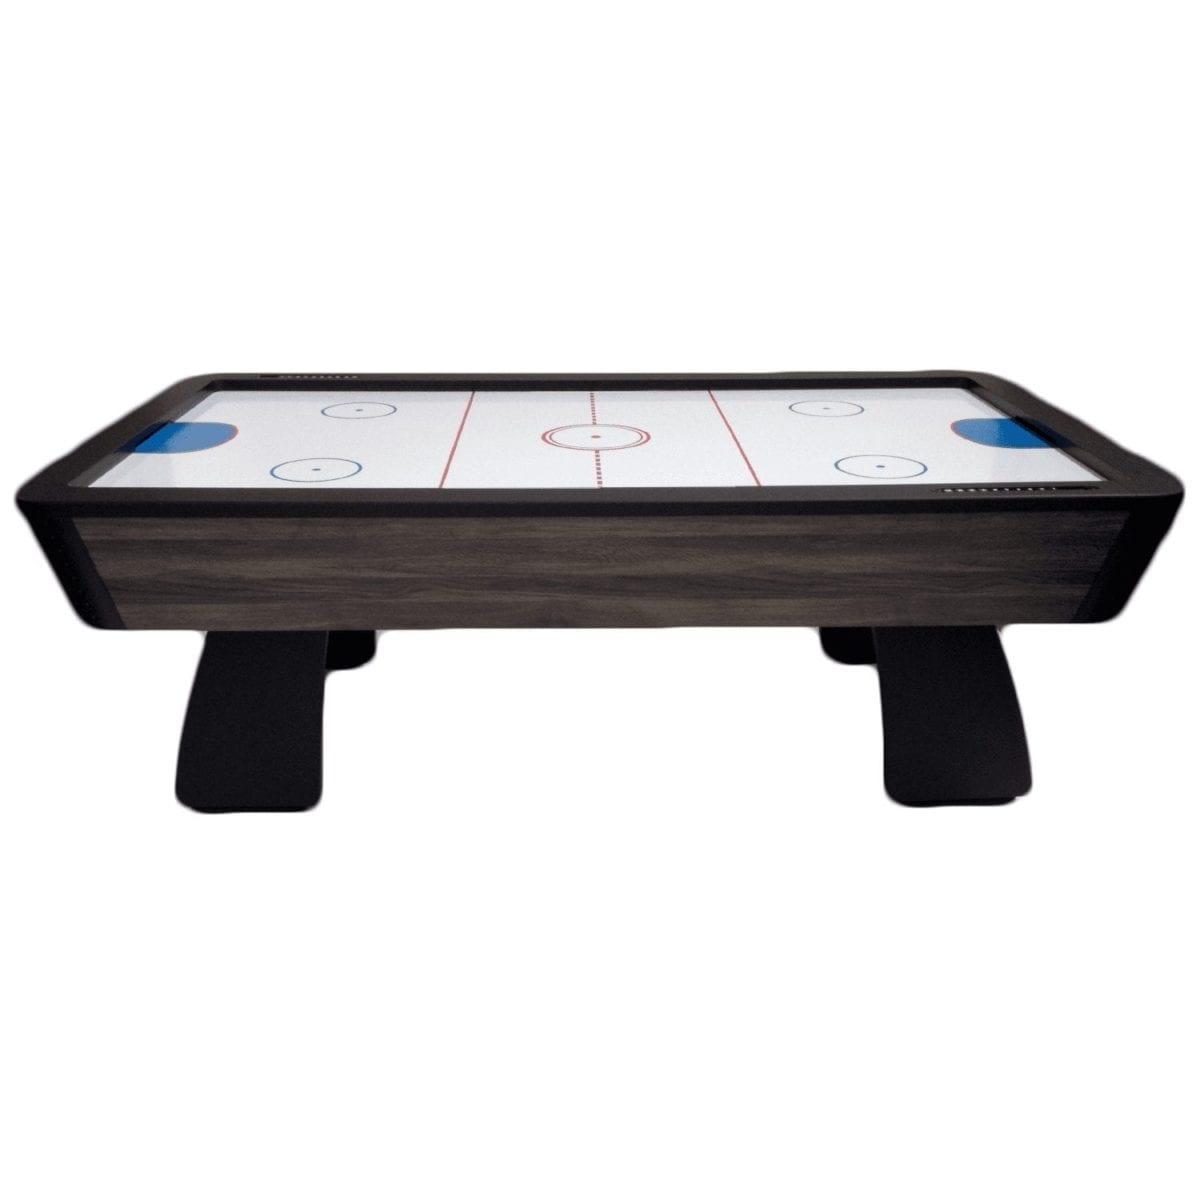 Marksman Greystone Air Hockey Table Games For Fun